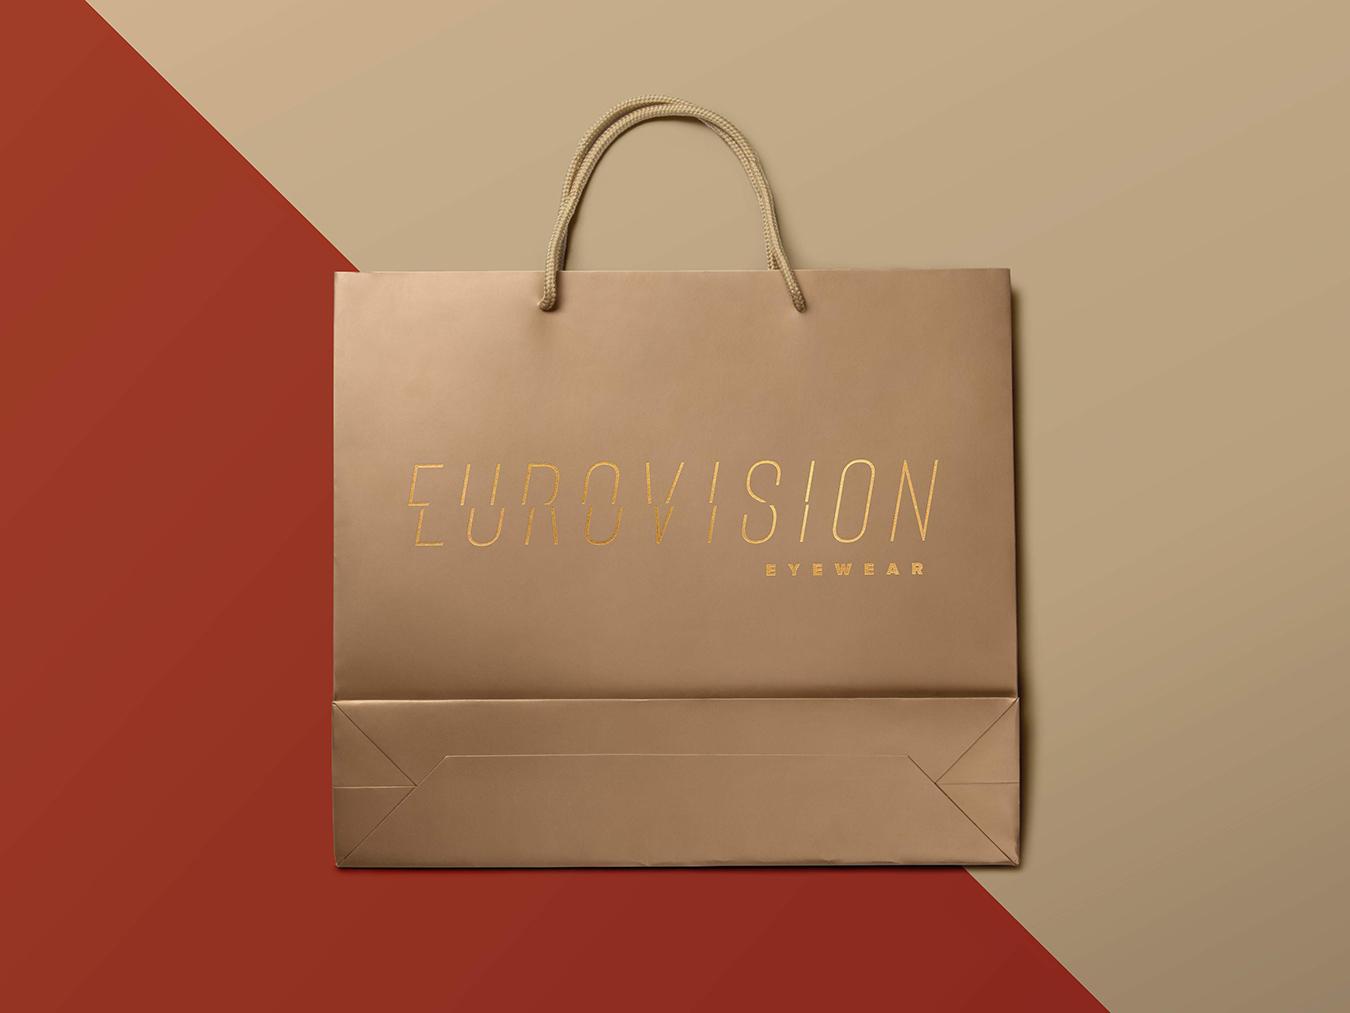 Eurovison vernier scale ロゴタイプ logodesign logotype